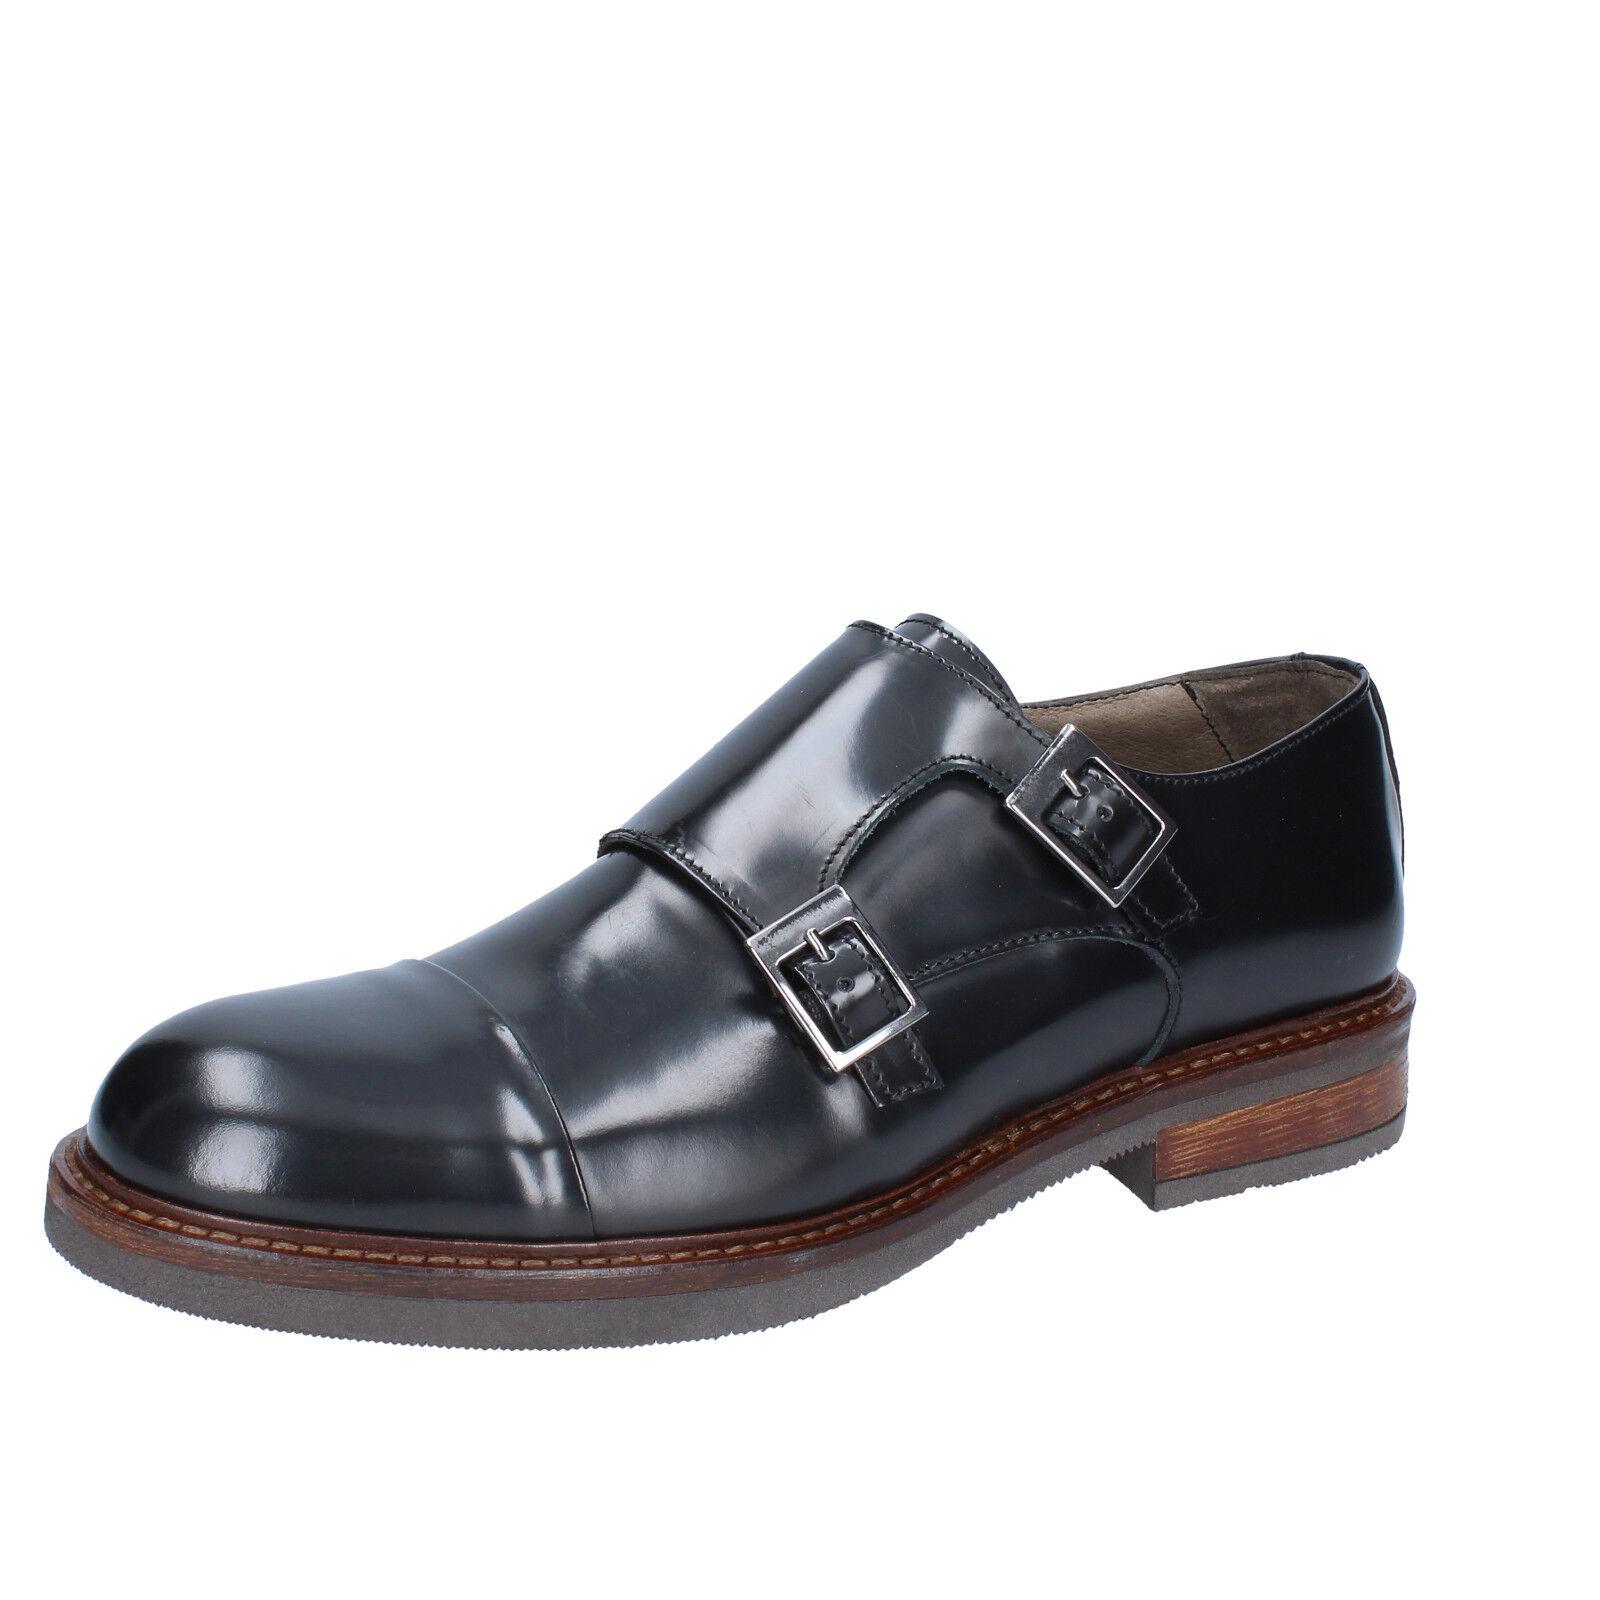 Men's shoes FDF SHOES 7 (EU 40) elegant black shiny leather BZ333-40